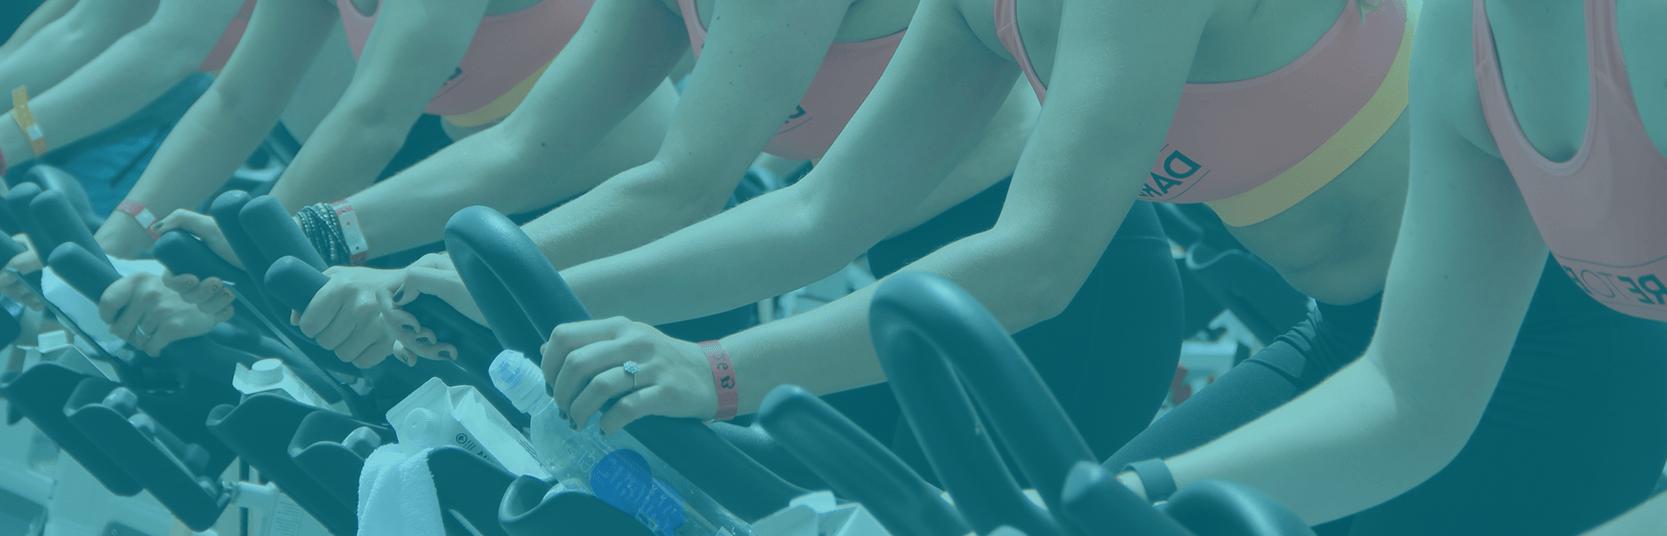 Resamania le logiciel fitness du groupe StadLine - Réservation biking - Fond